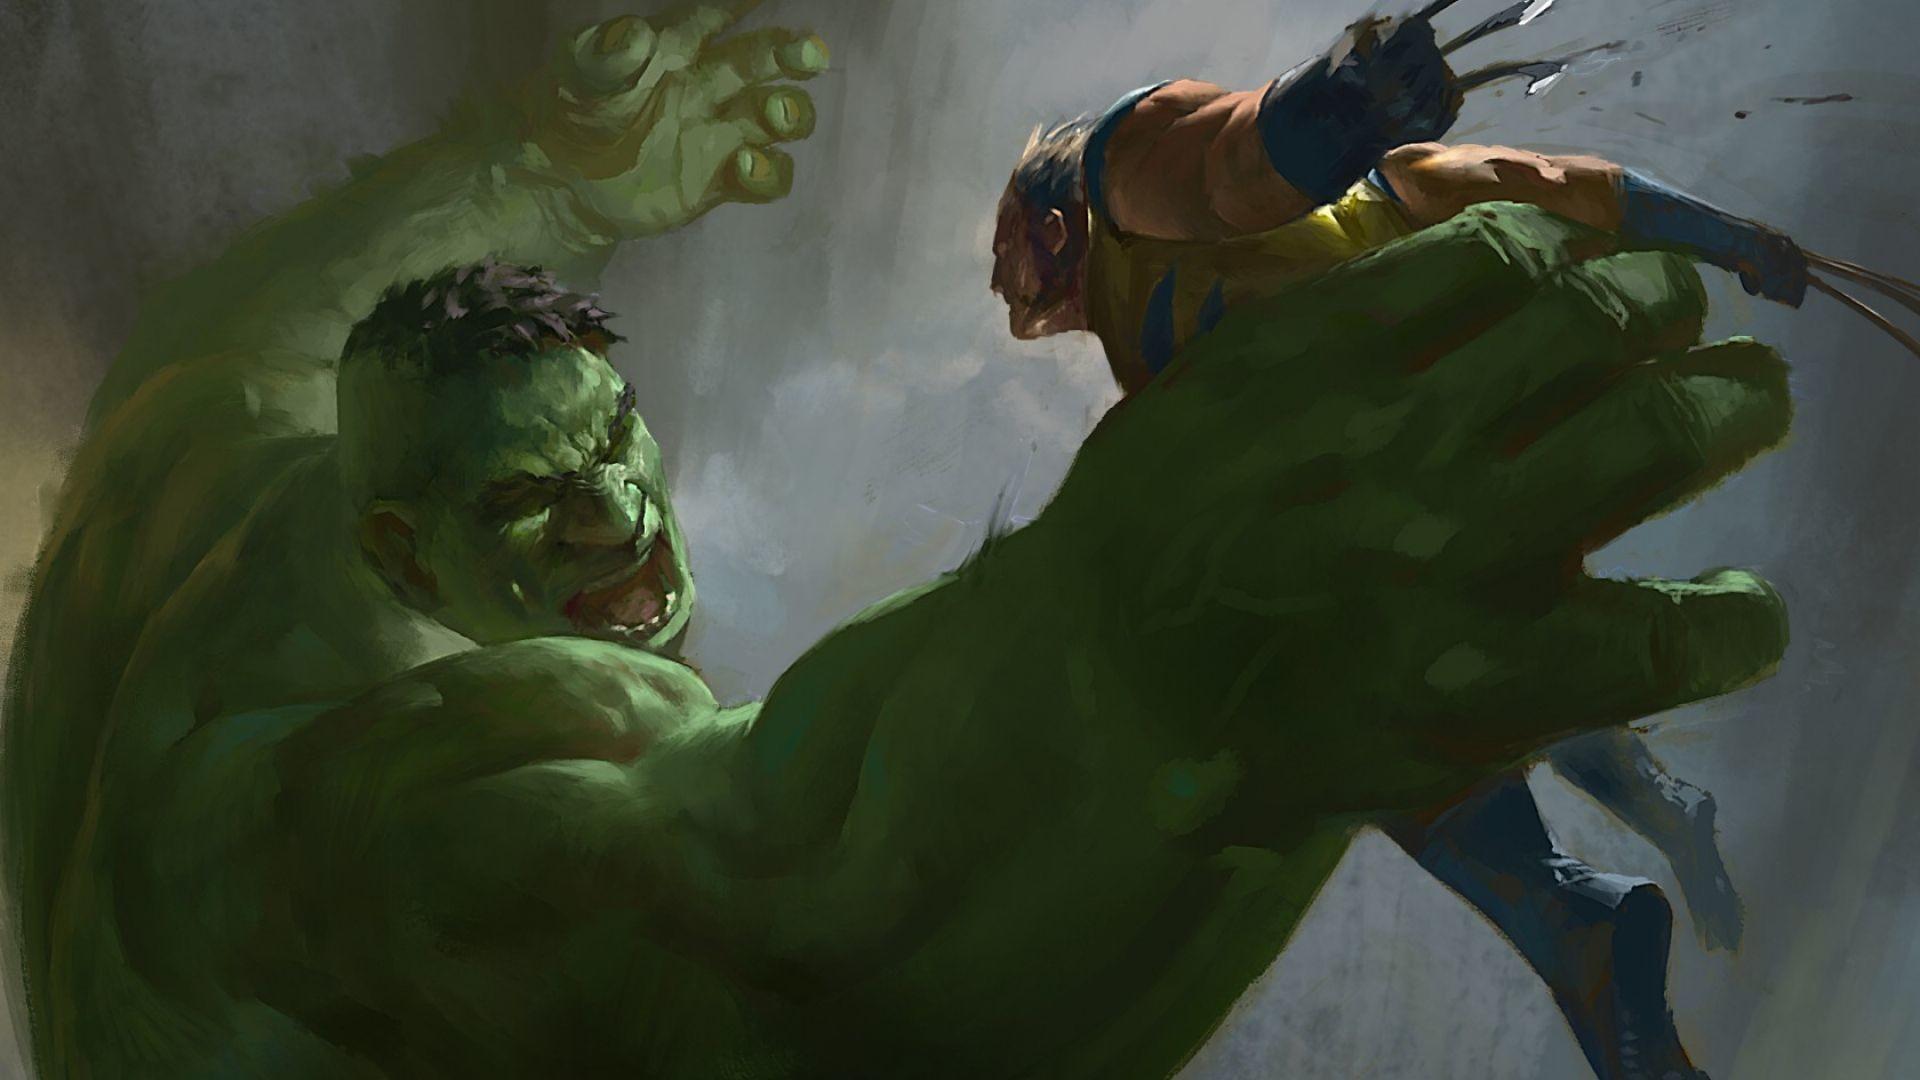 Download Wallpaper Hulk, Wolverine, X-men, Marvel comics .